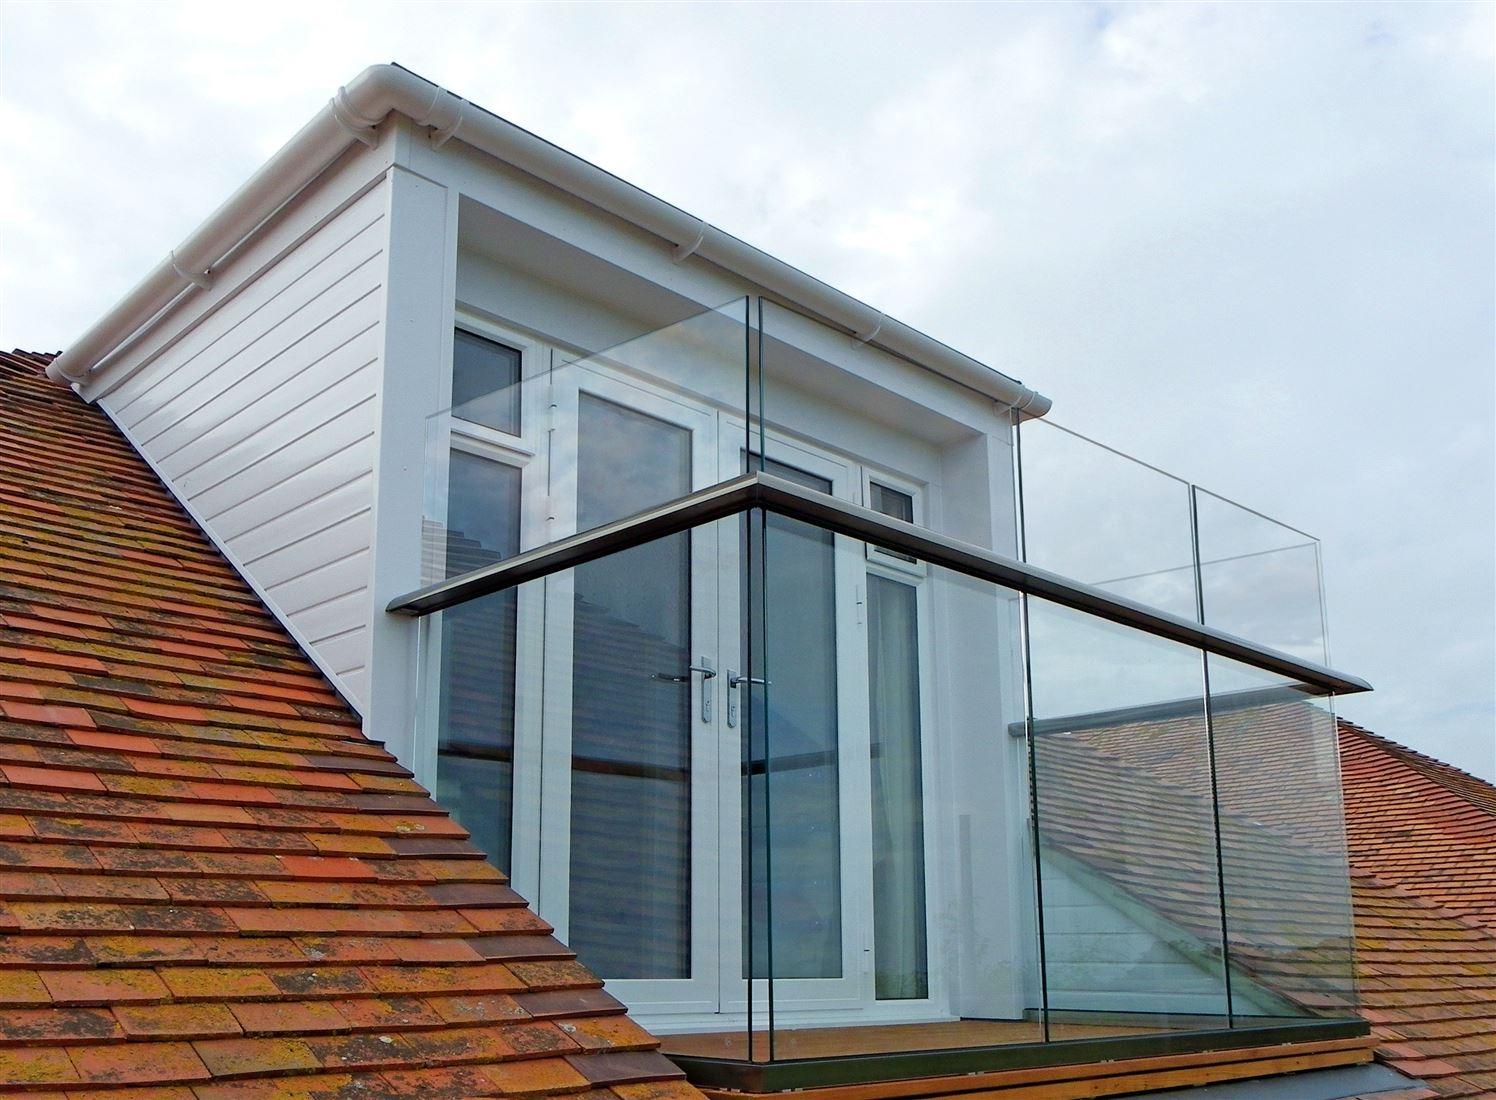 Glass Patio Railings | Patio Glass Balustrades - Glass ...